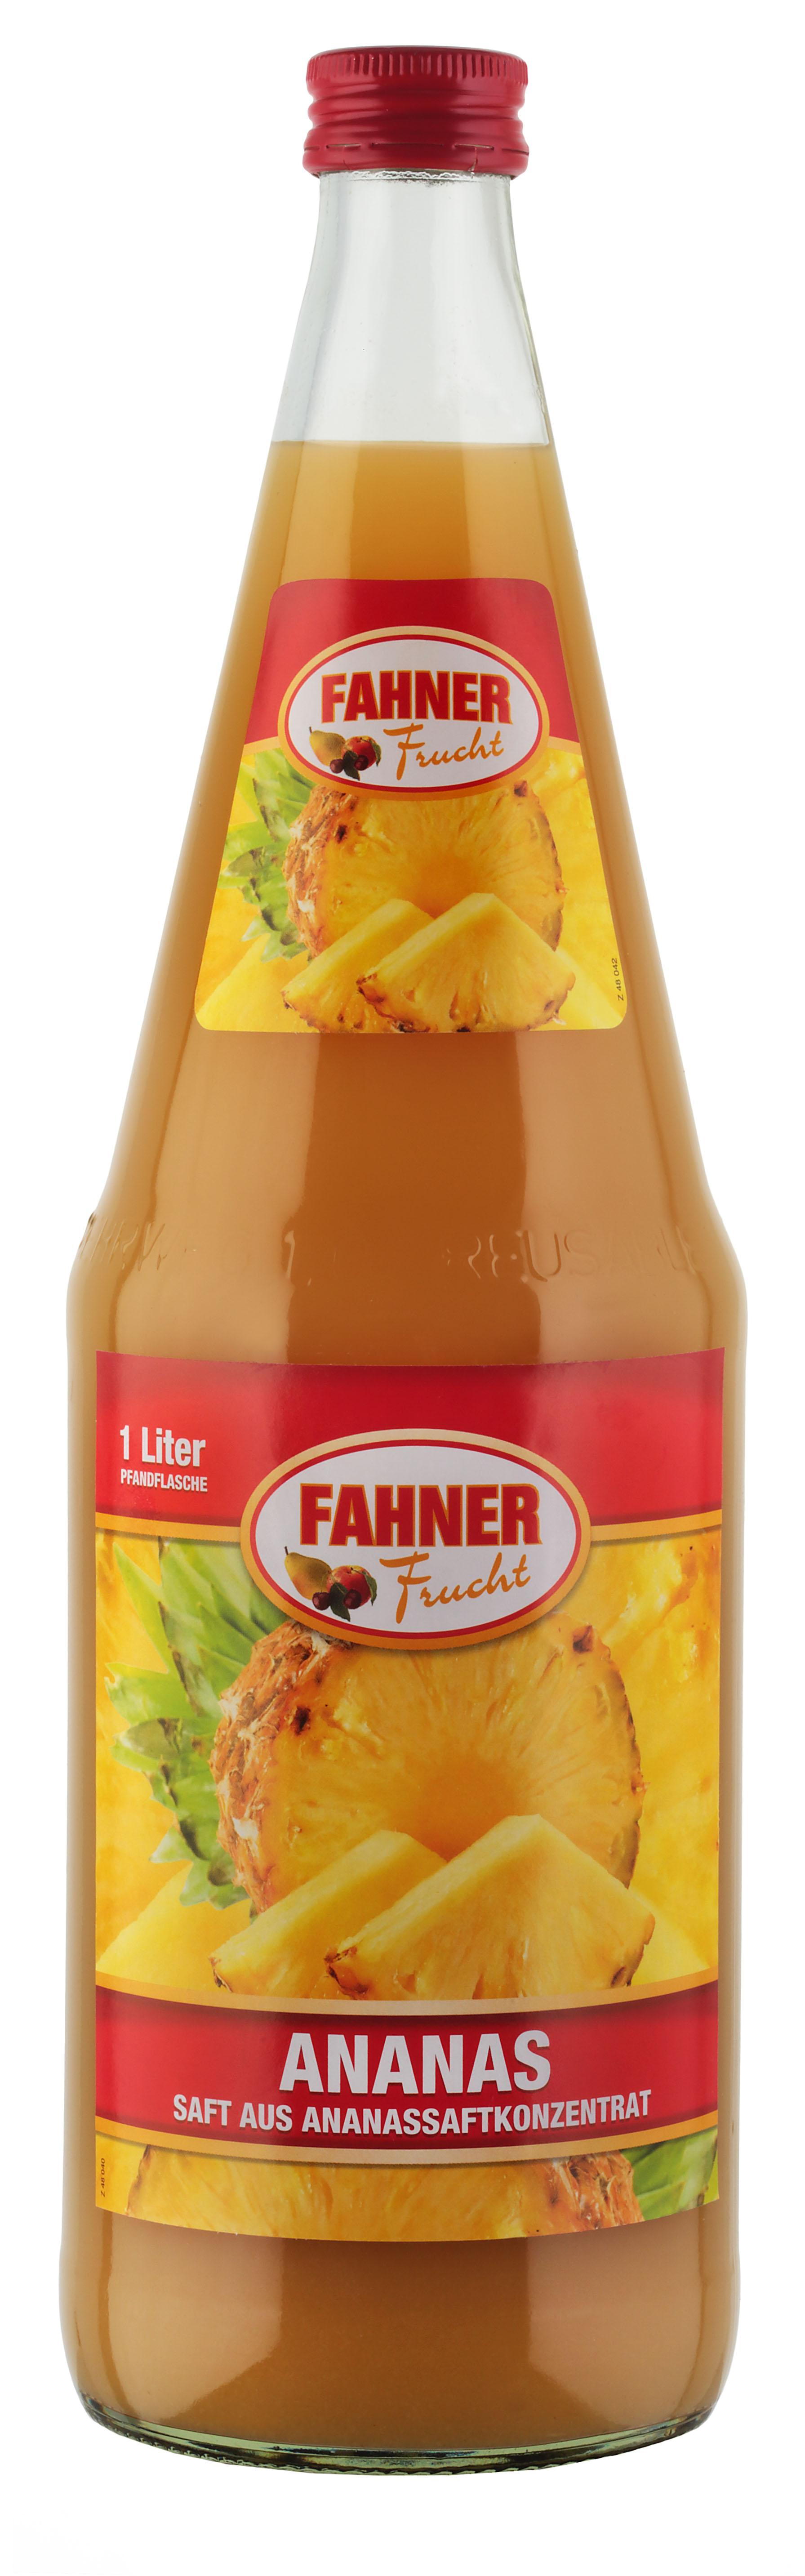 FAHNER Ananassaft 6x1 l